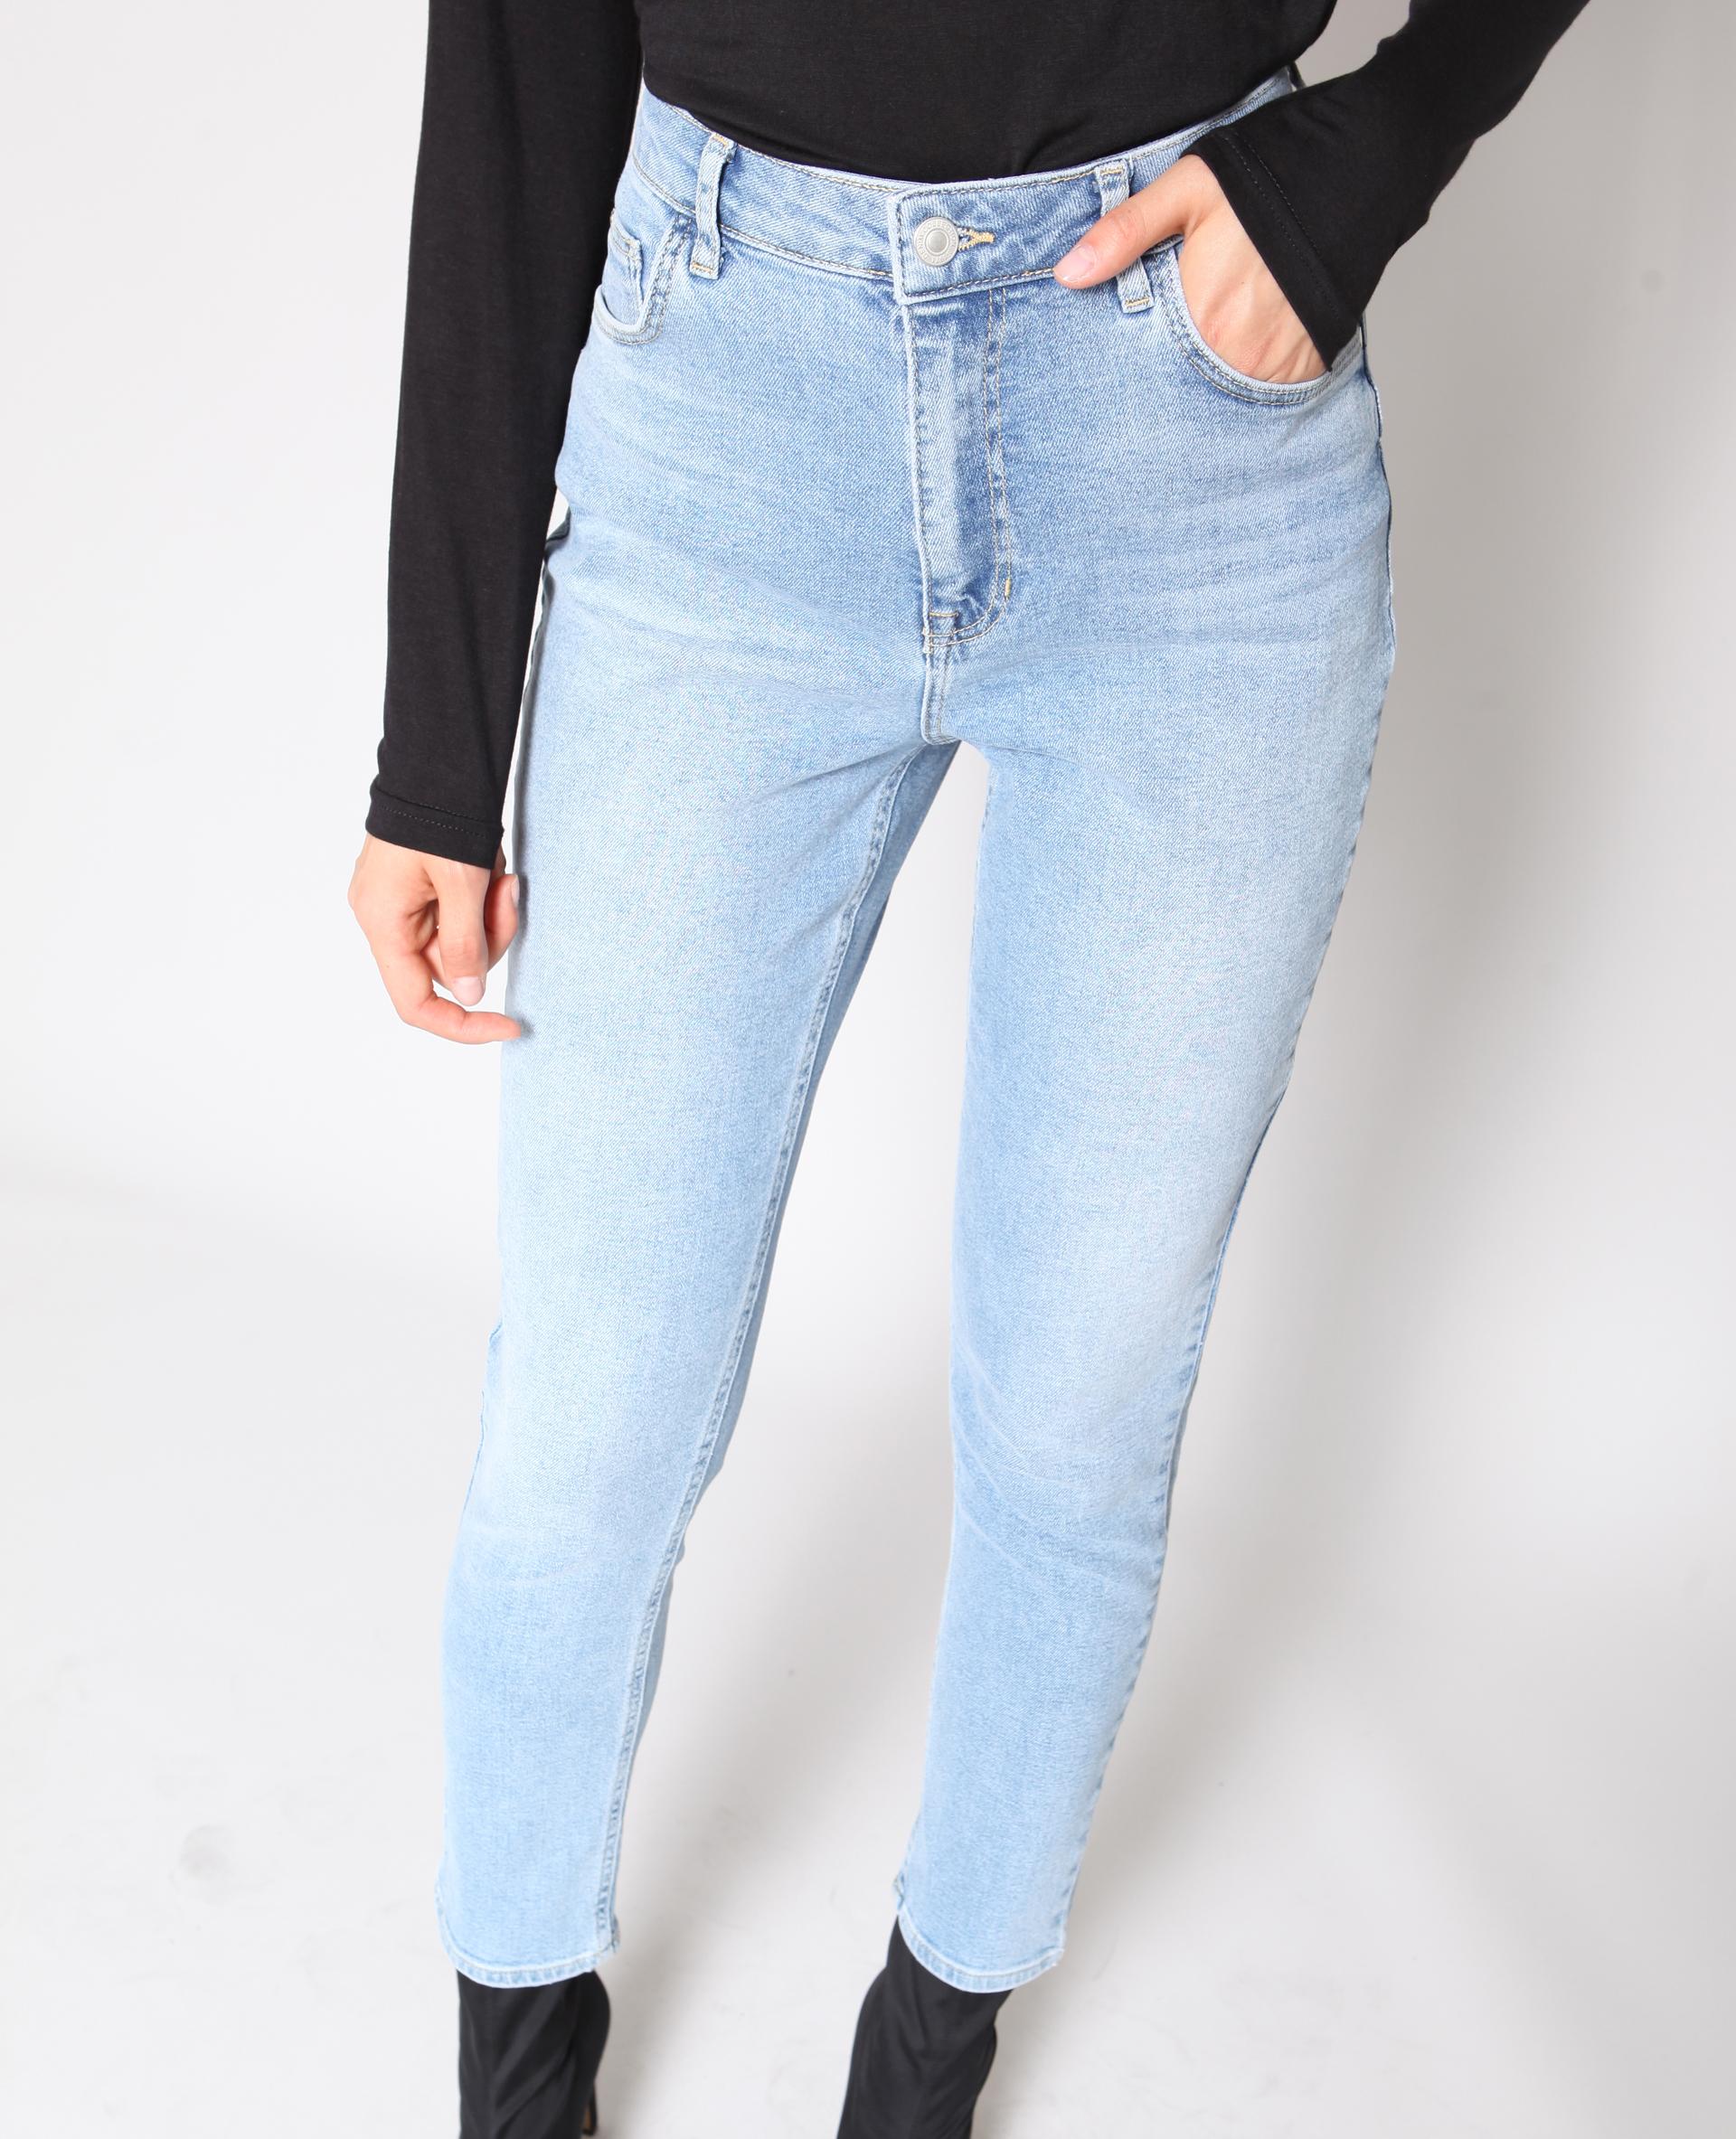 Jean slim taille haute bleu - Pimkie